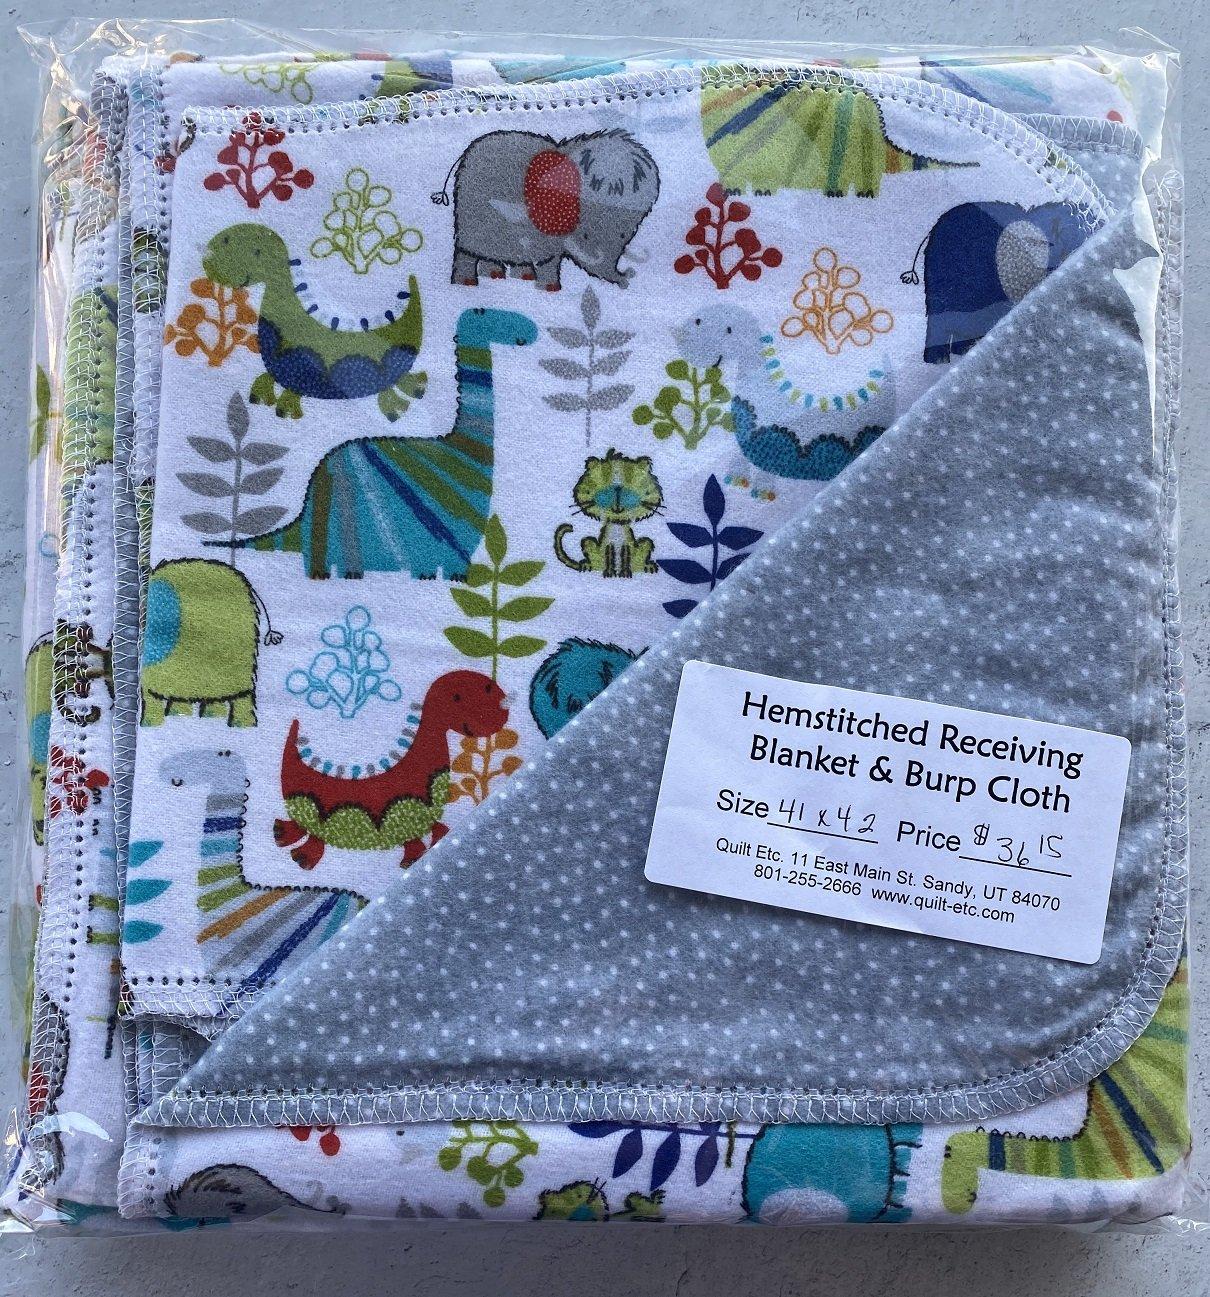 Hemstitched Receiving Blanket & Burp Cloth 14